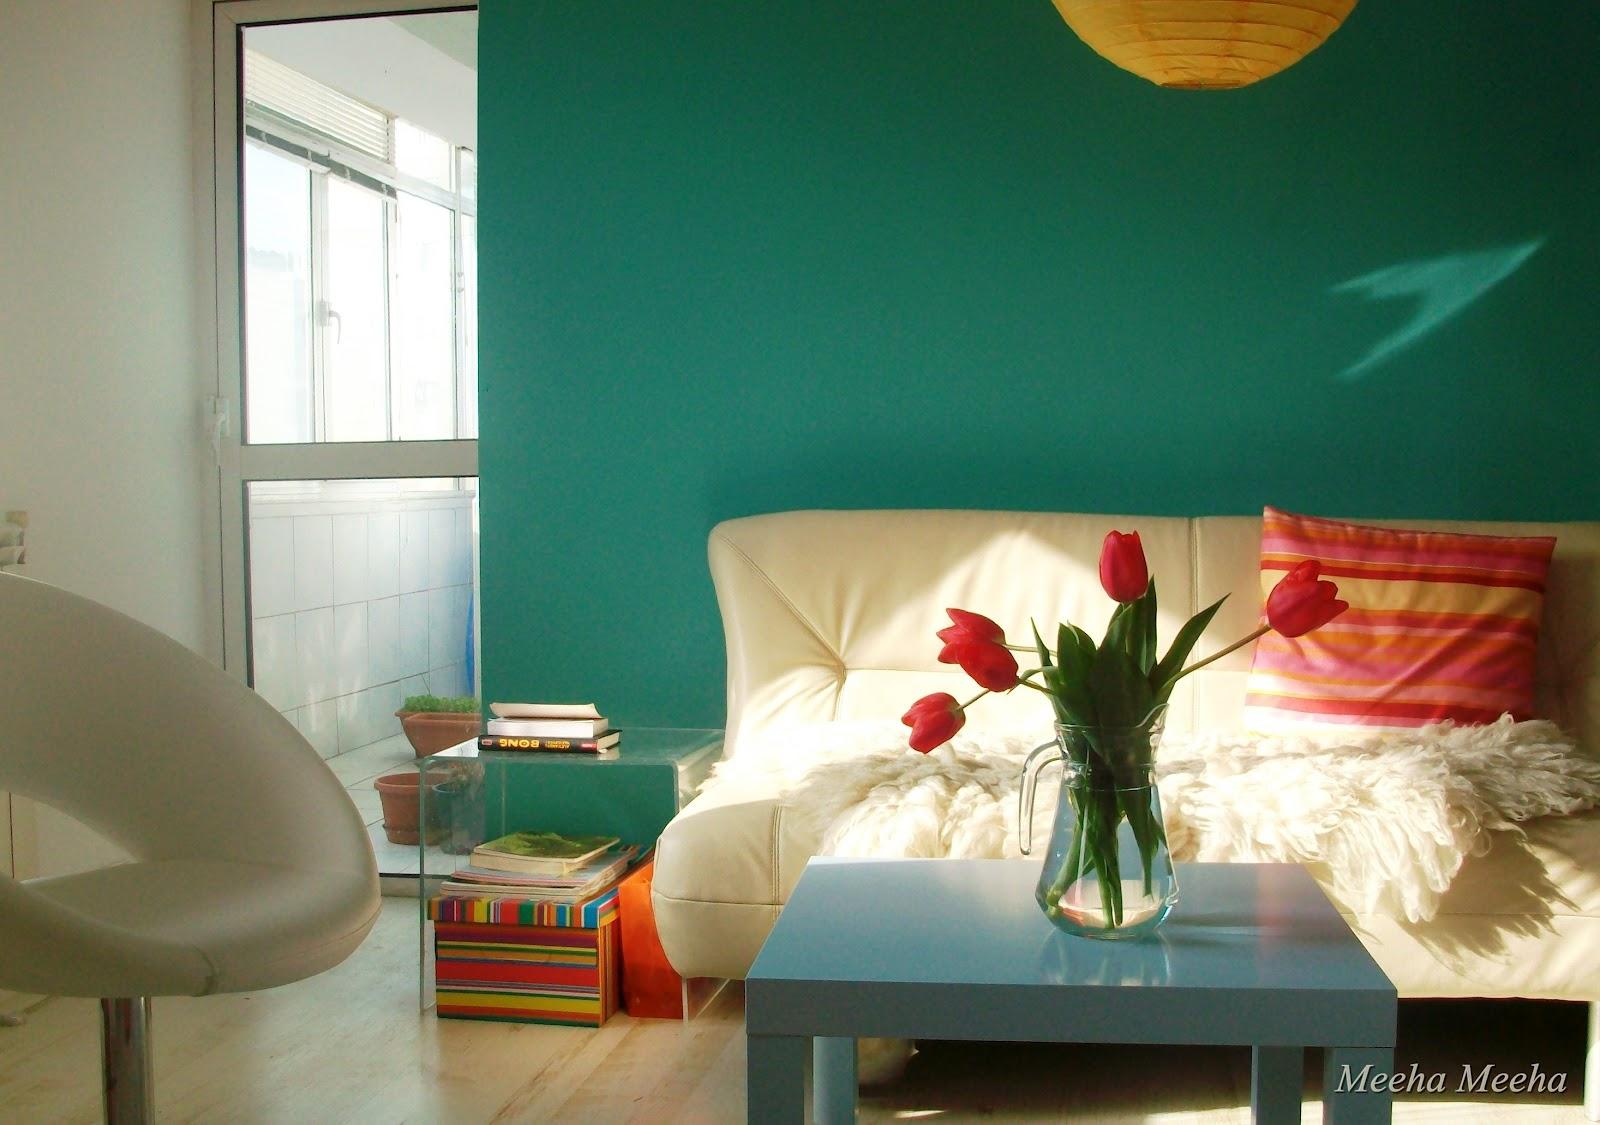 Meeha Meeha: Turquoise living room